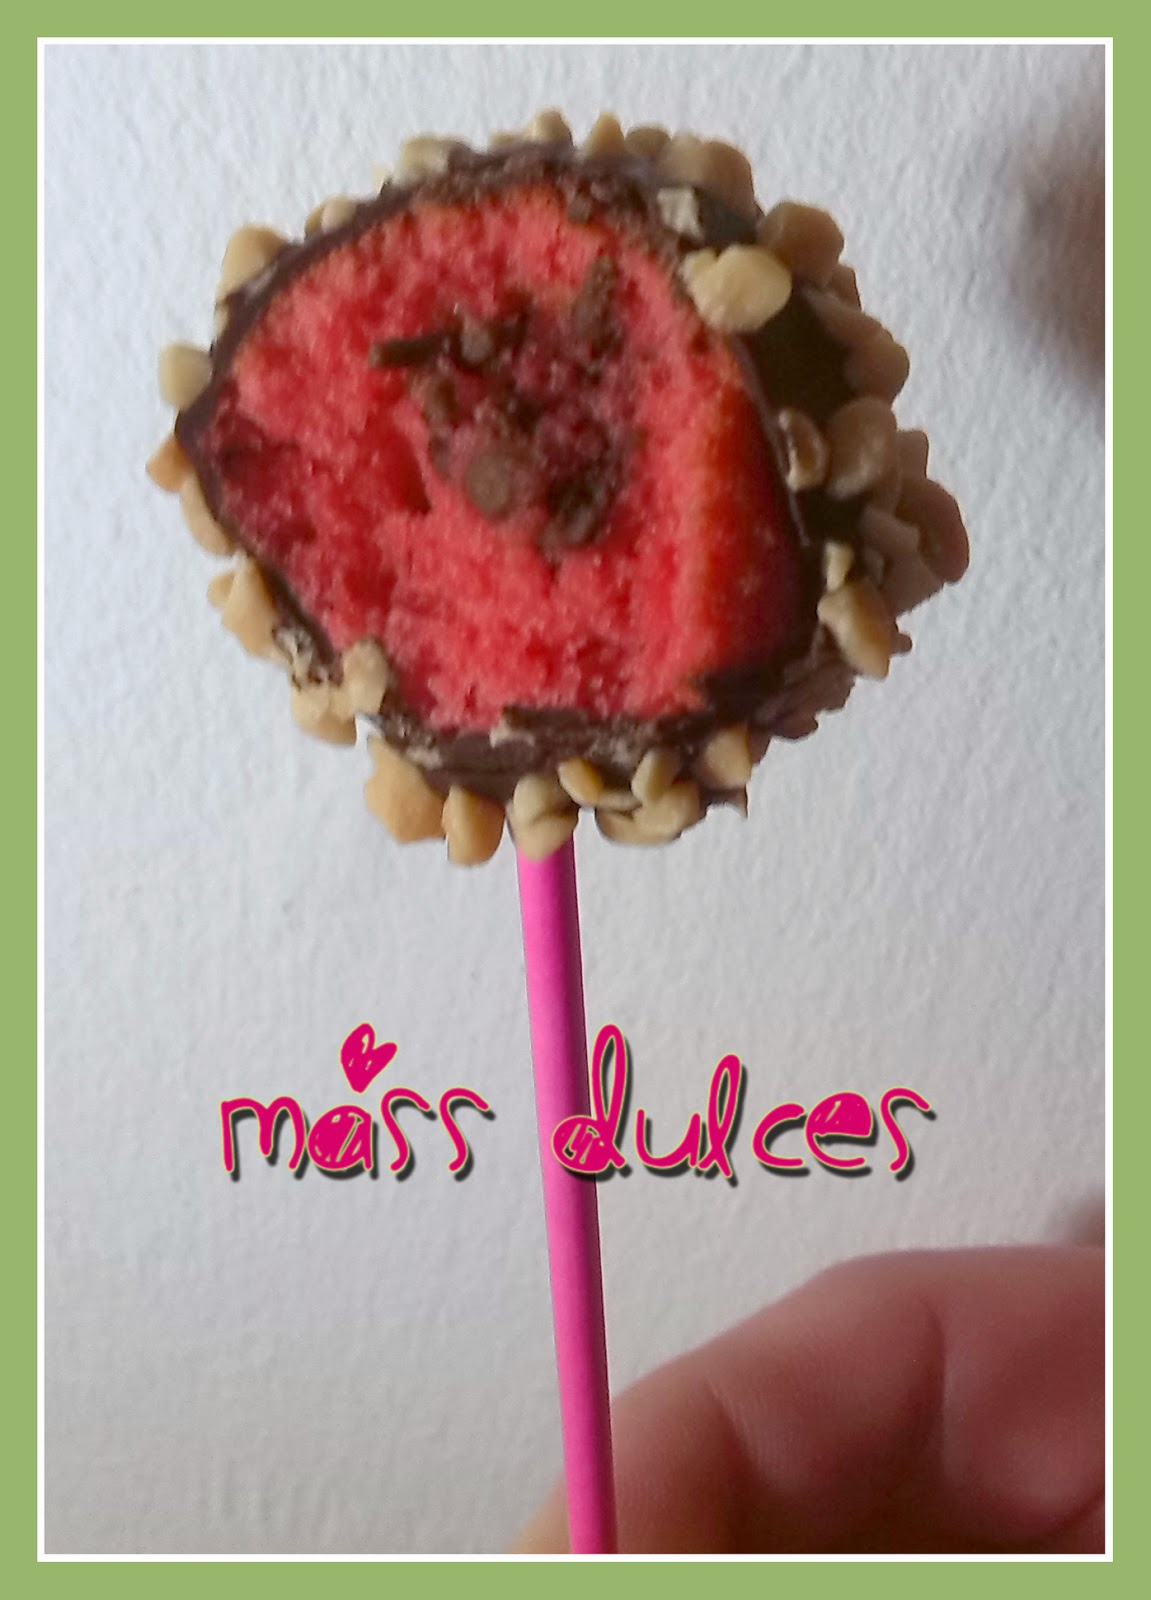 Mass dulces cakes pops rosas rellenos de rocher y for Cake pops cobertura